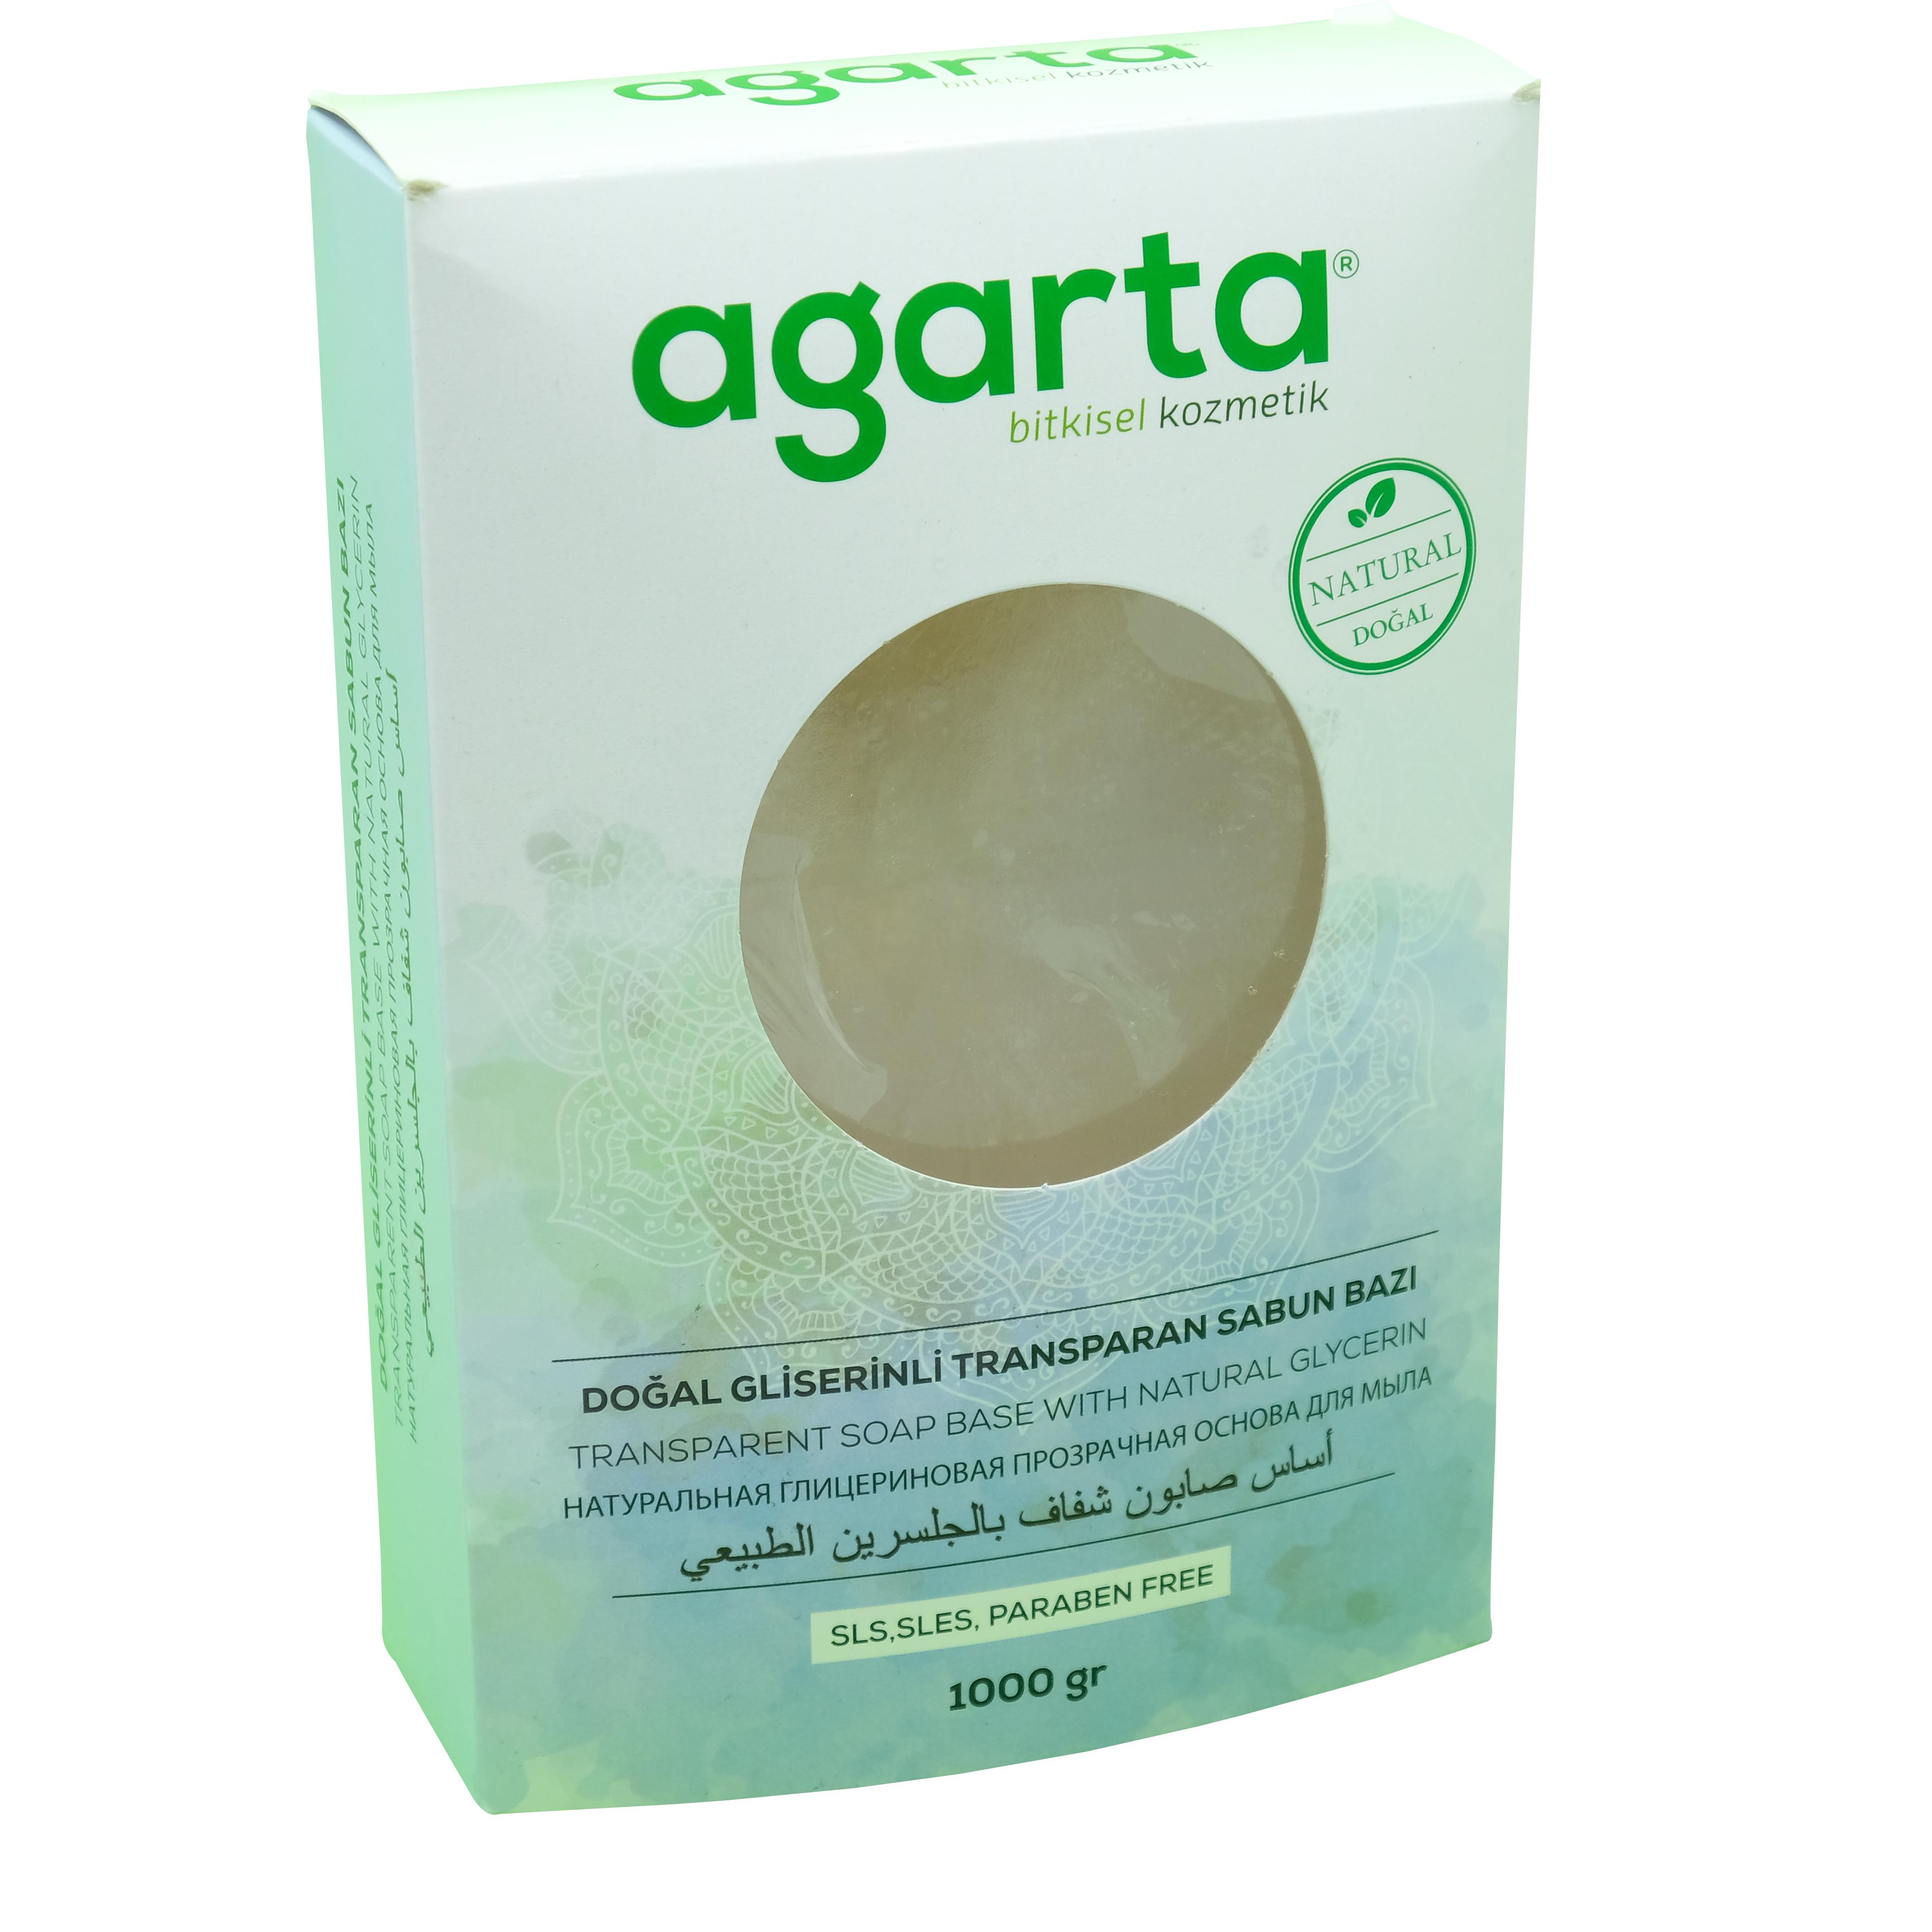 Agarta Natural Gliserinli Transparan Sabun Bazı